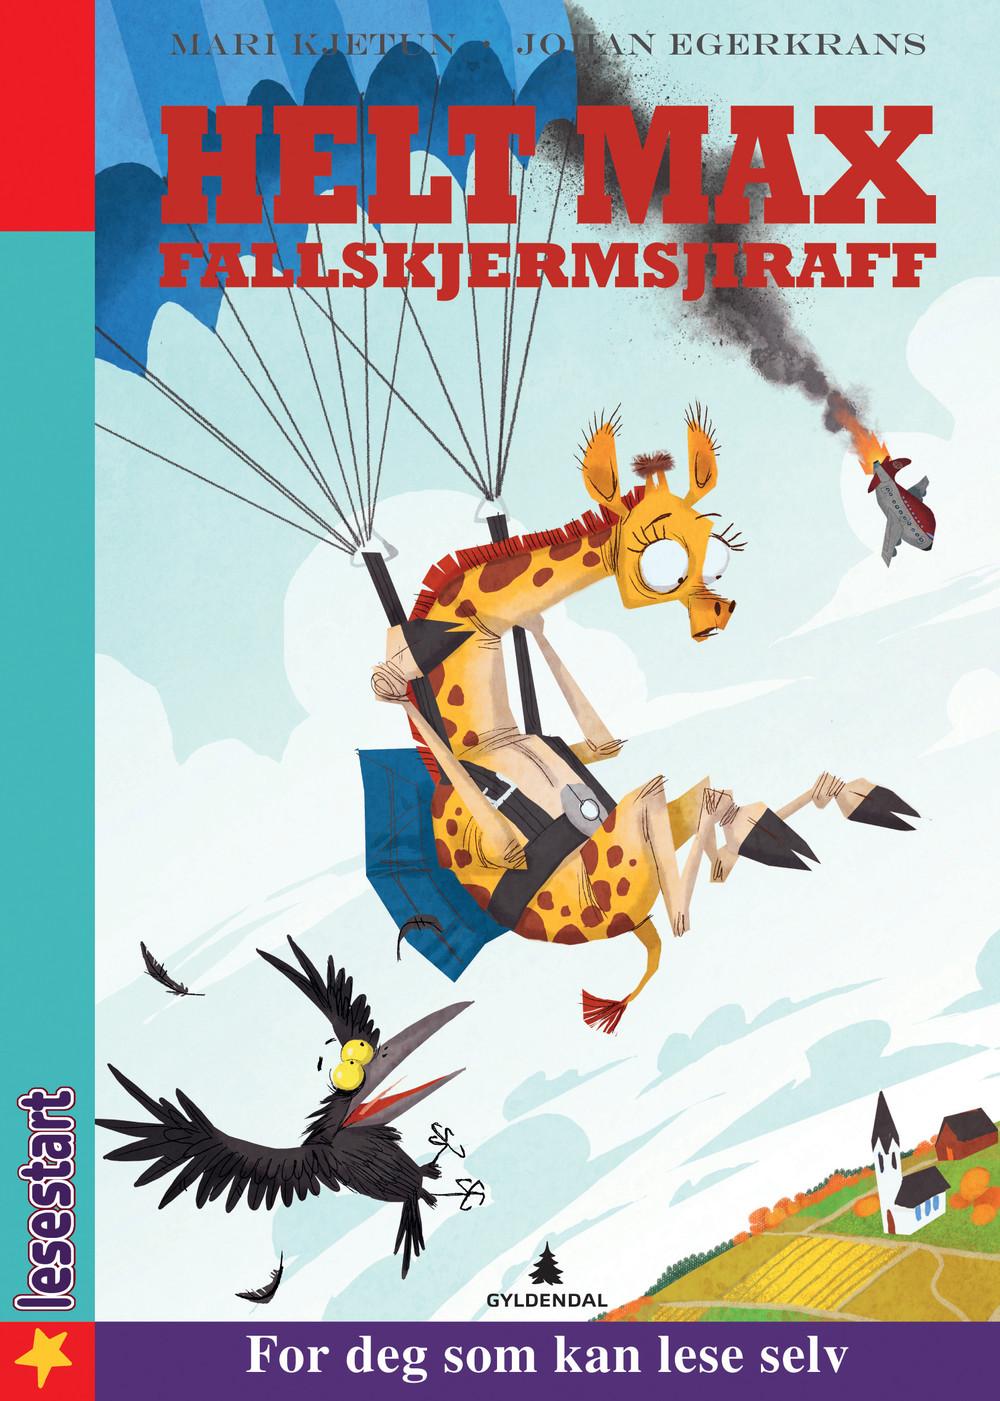 Helt-Max-fallskjermsjiraff_hd_image.jpg